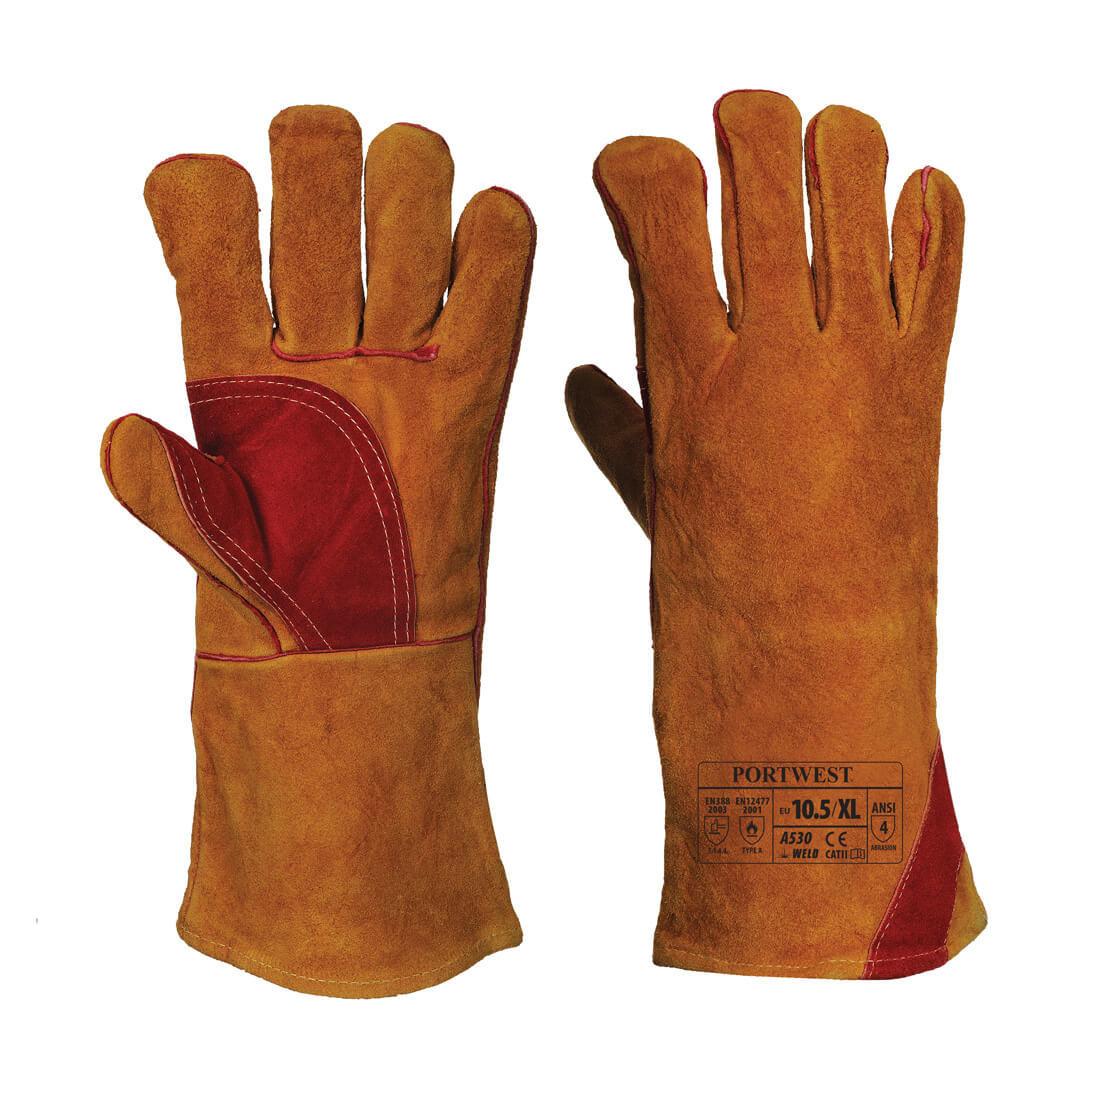 Manusa Reinforced Welding - Echipamente de protectie personala